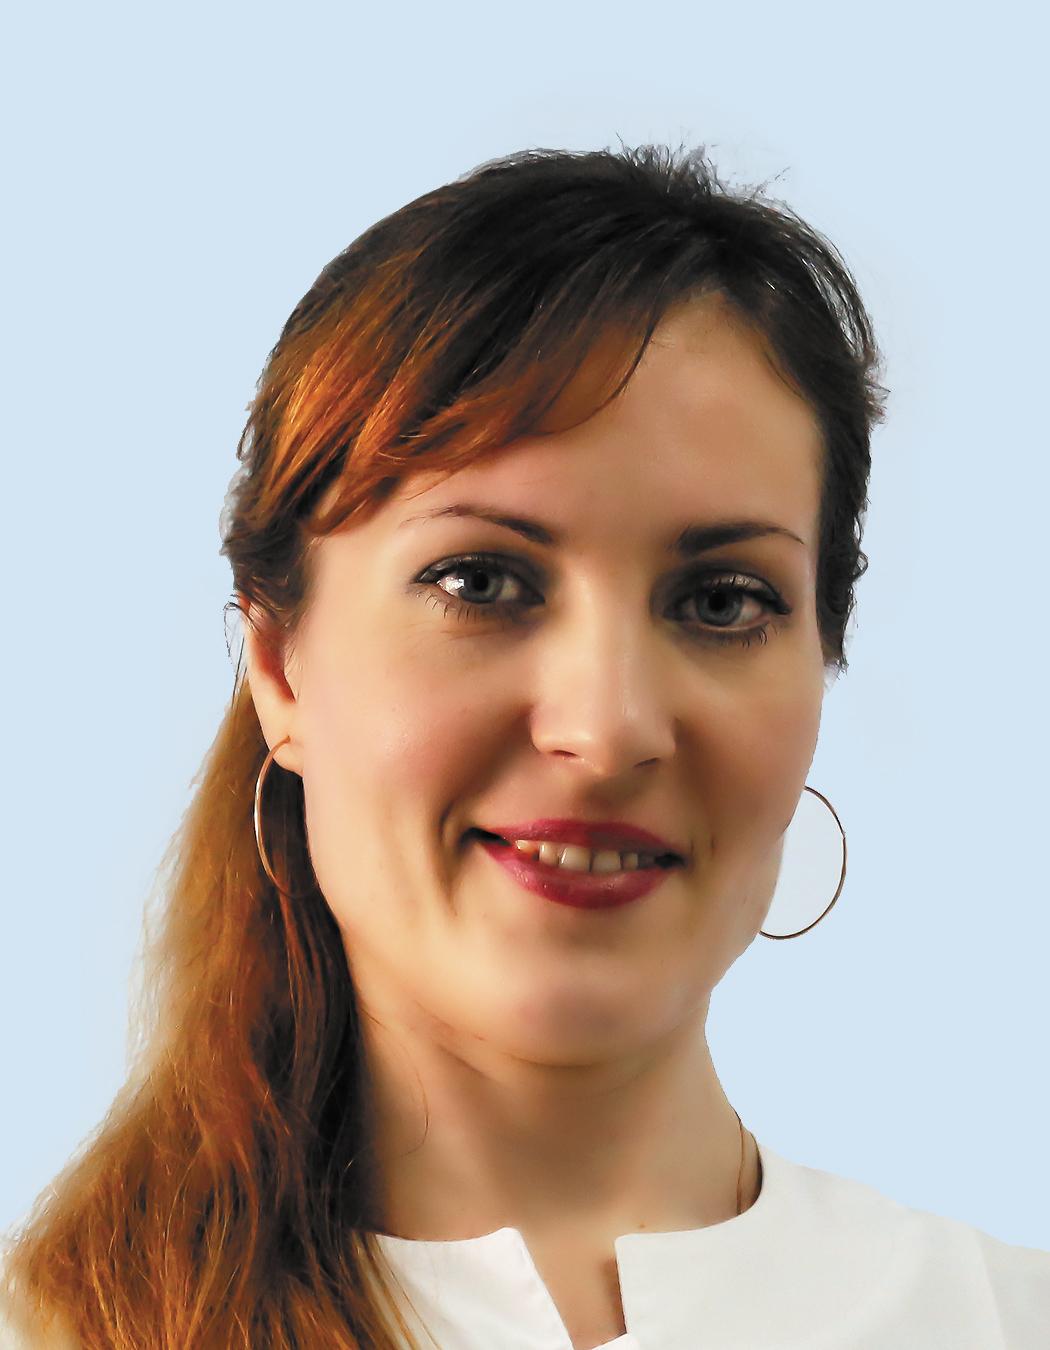 Проскурина Ирина Николаевна, старший администратор